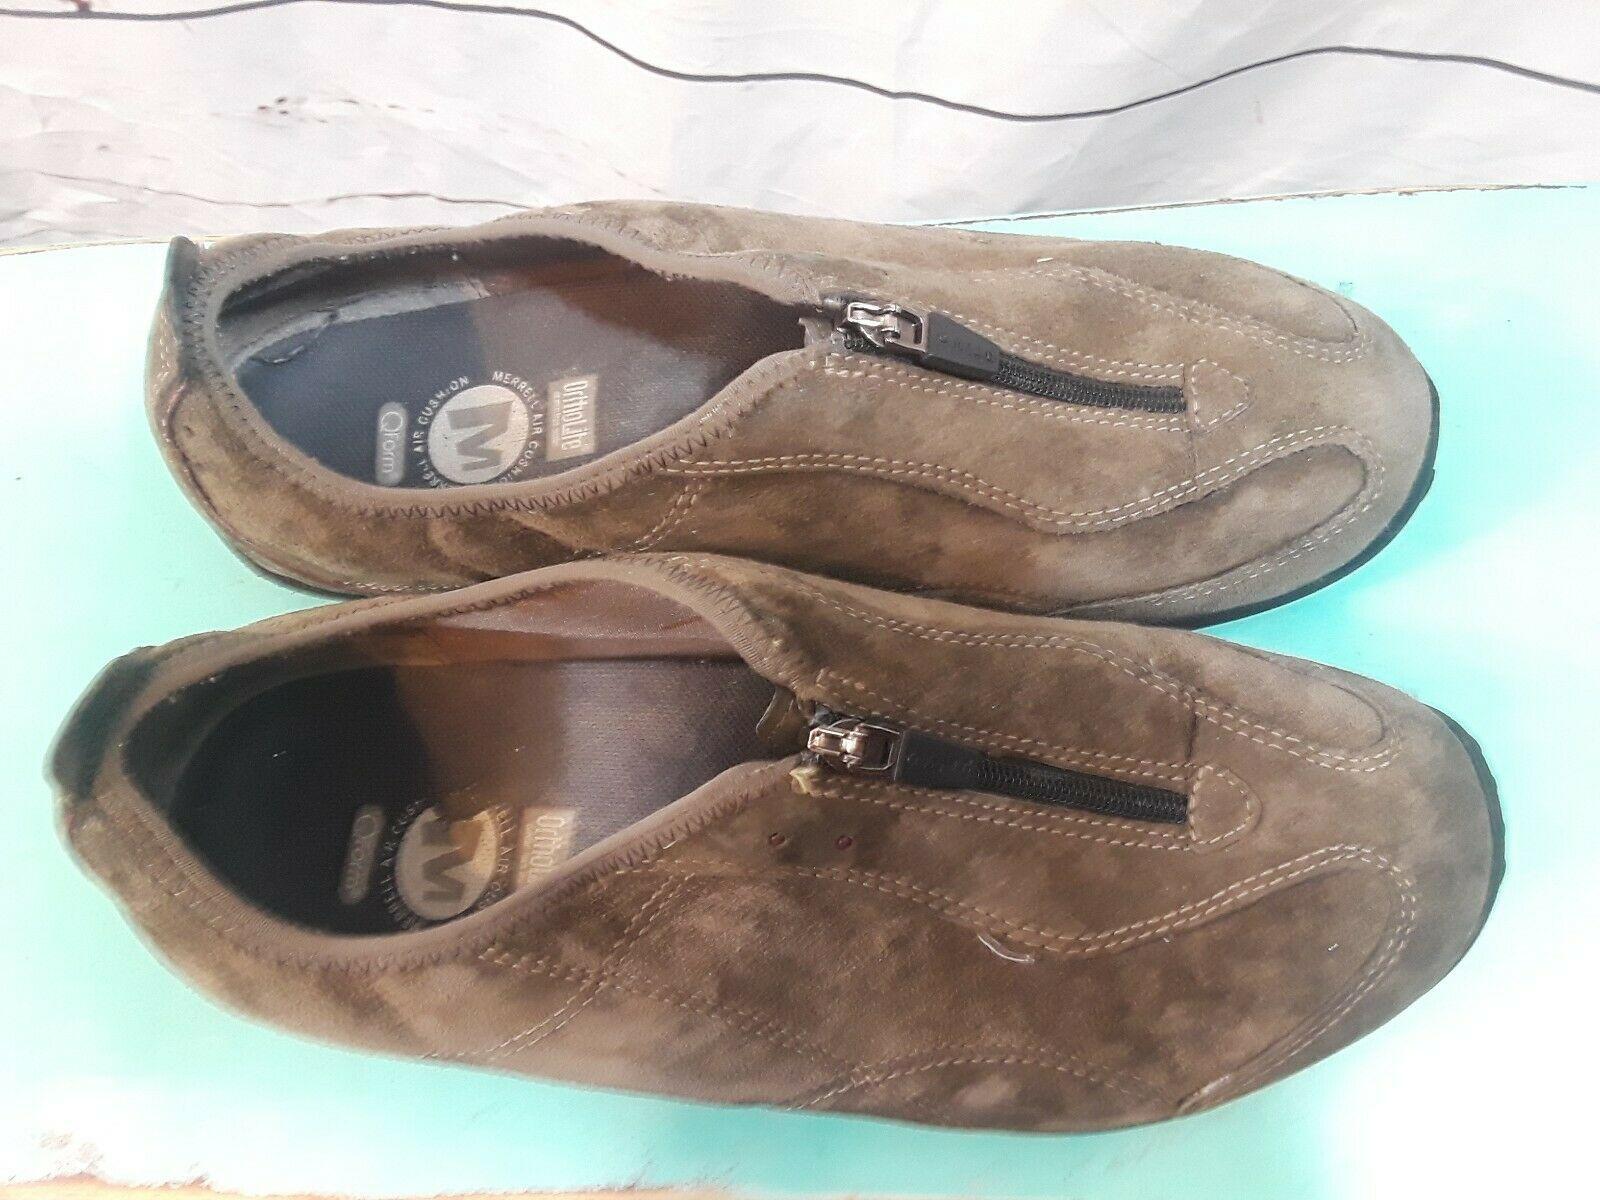 Merrell Shoes Size 8 Women Zipper Closing Brown Walking Comfort